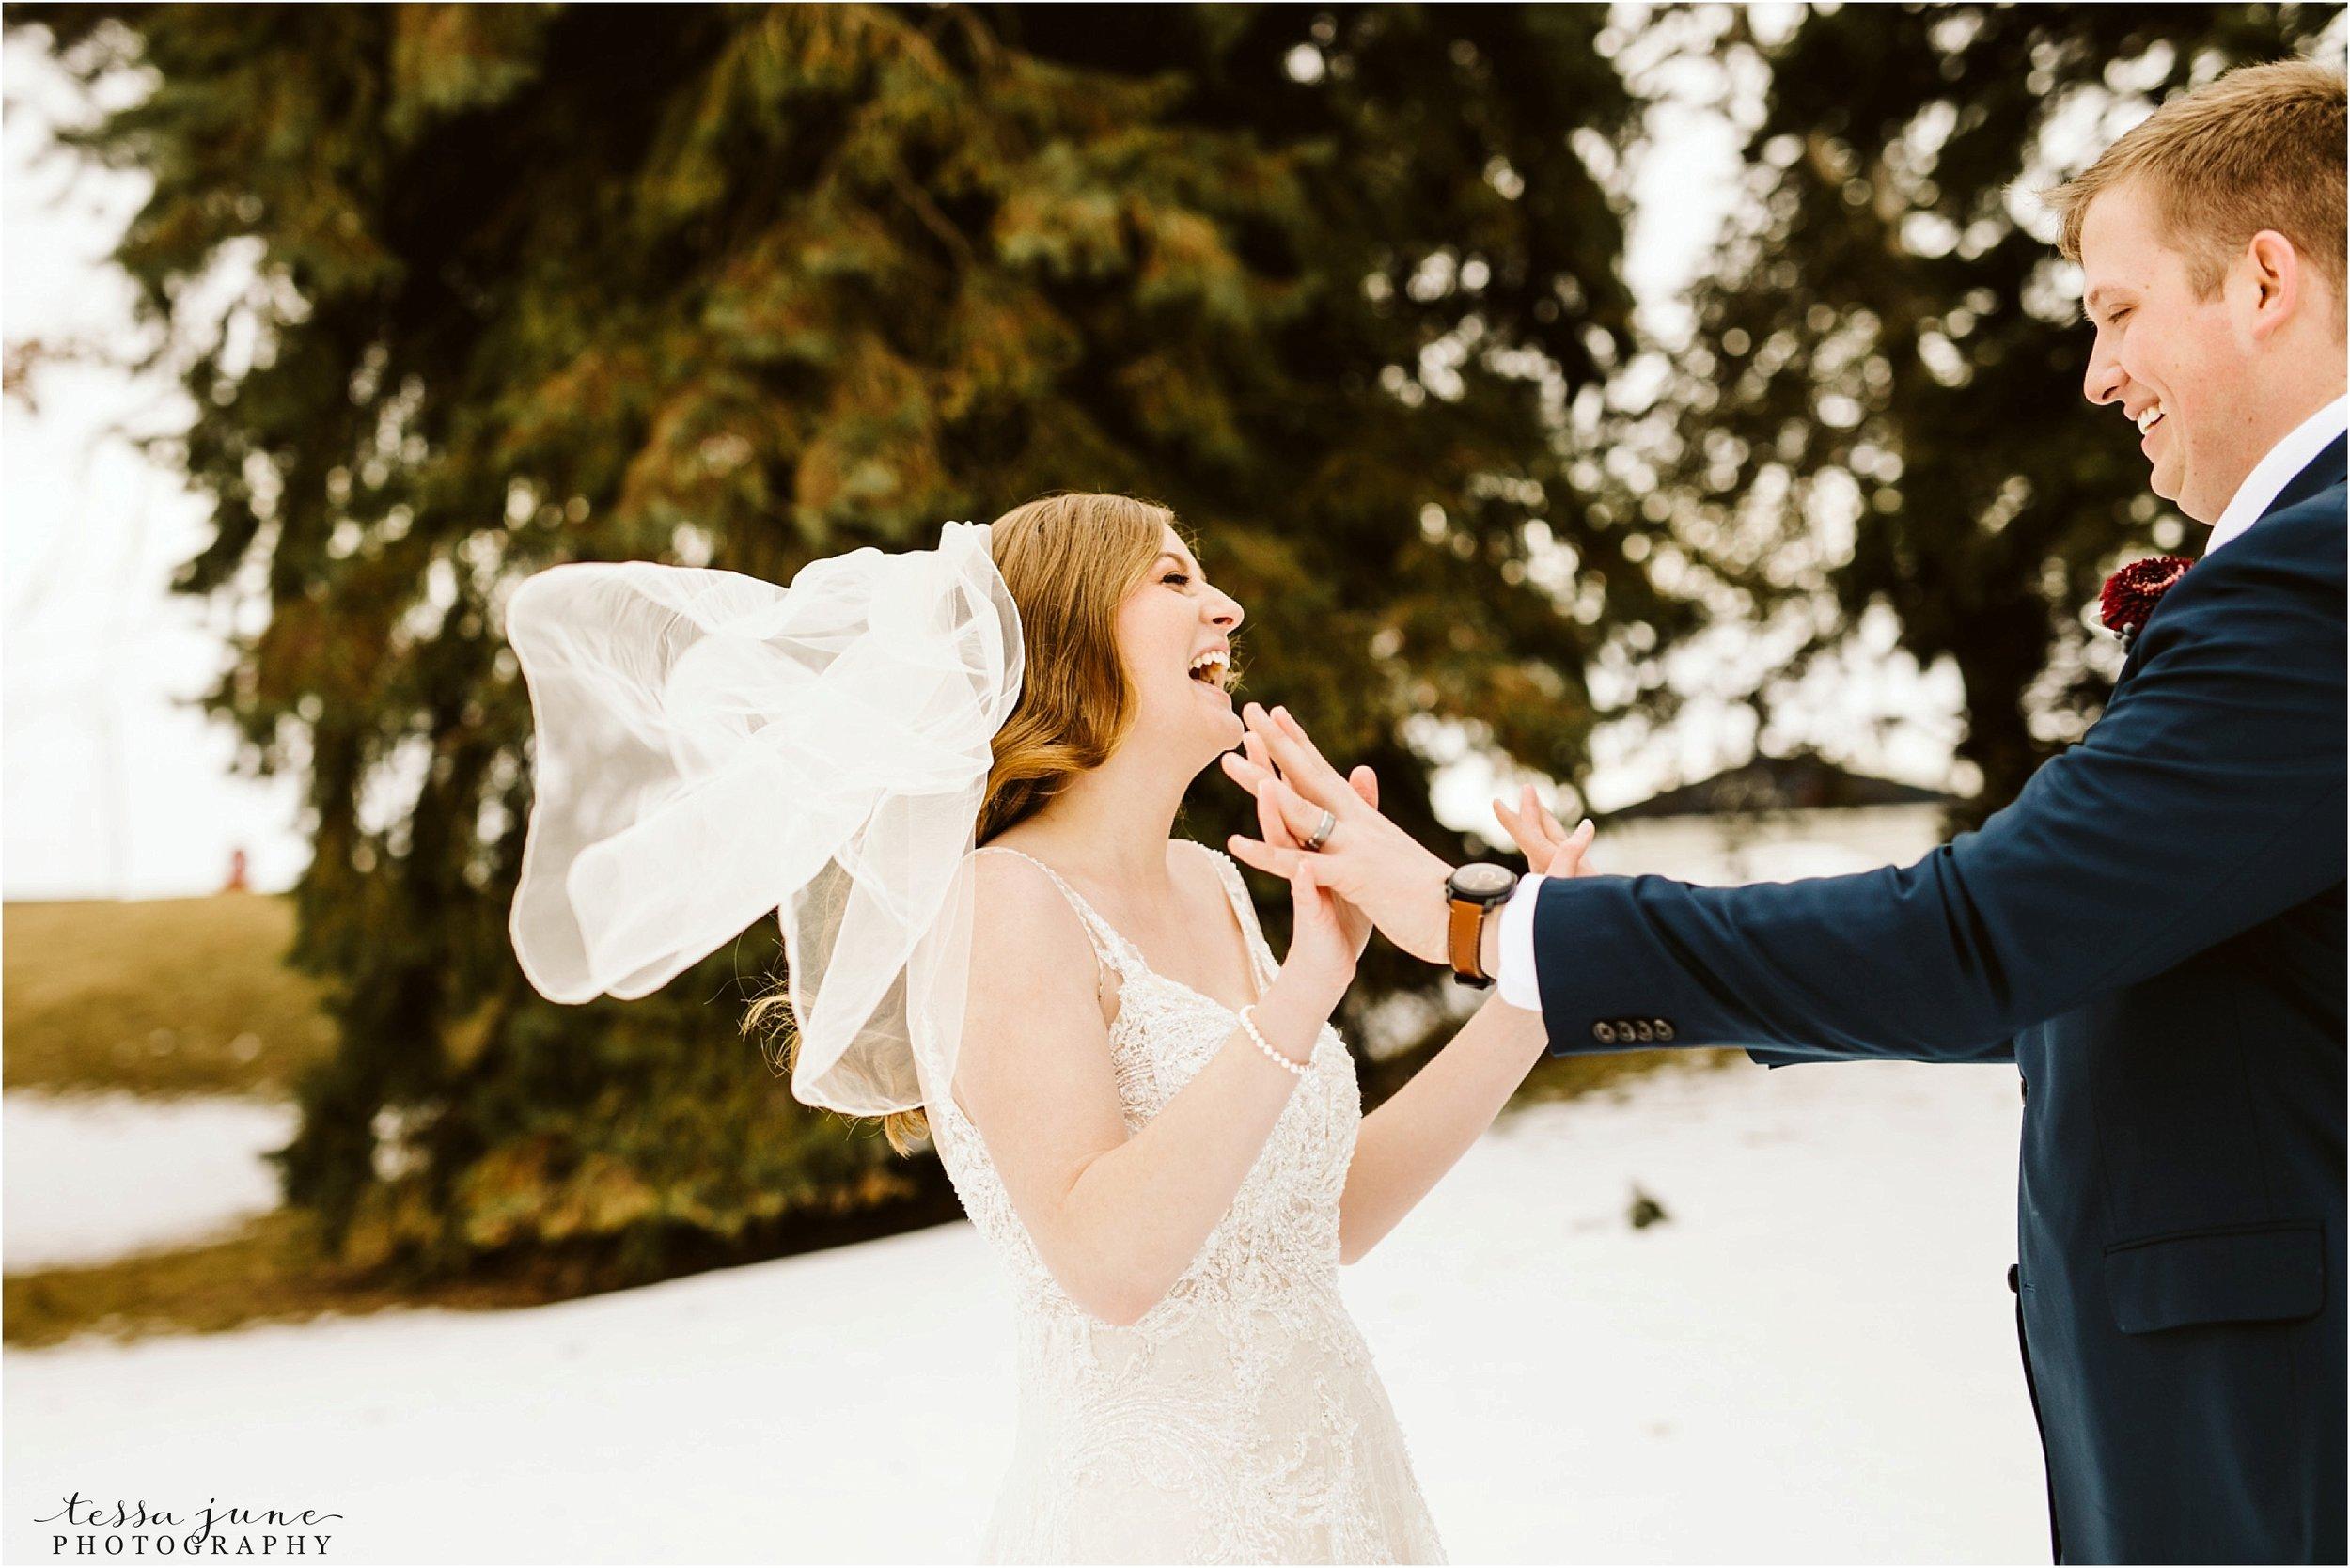 winter-wedding-in-eden-prairie-barn-minnesota-airplane-81.jpg